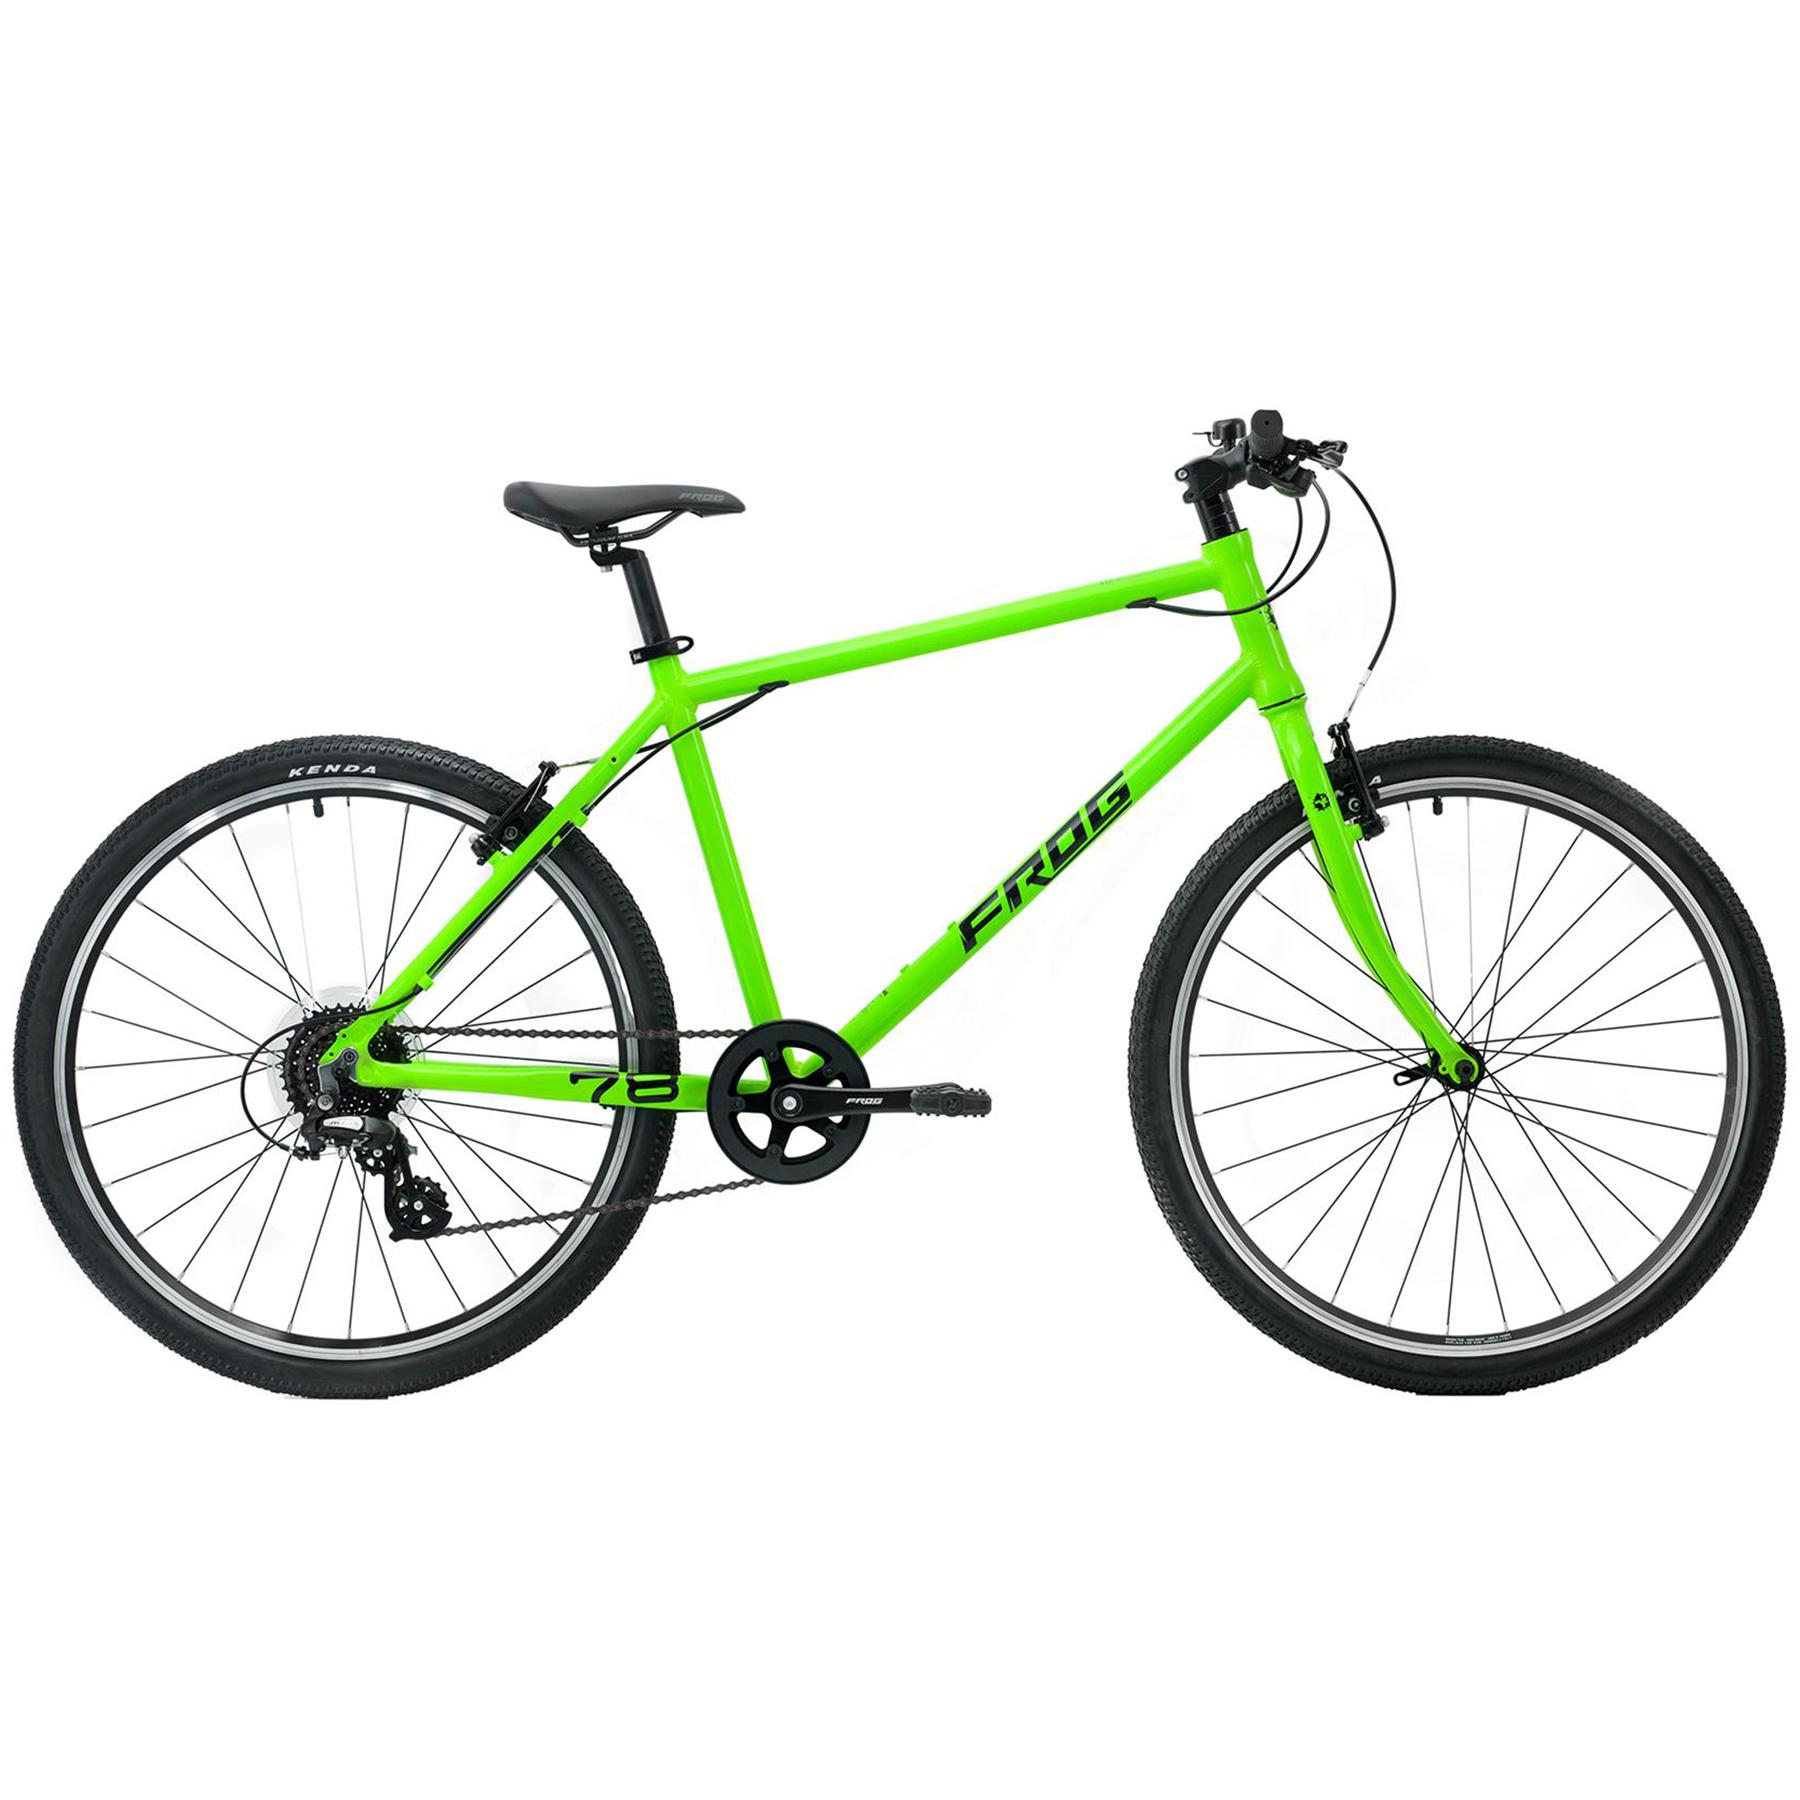 Frog 78 Kids Bike